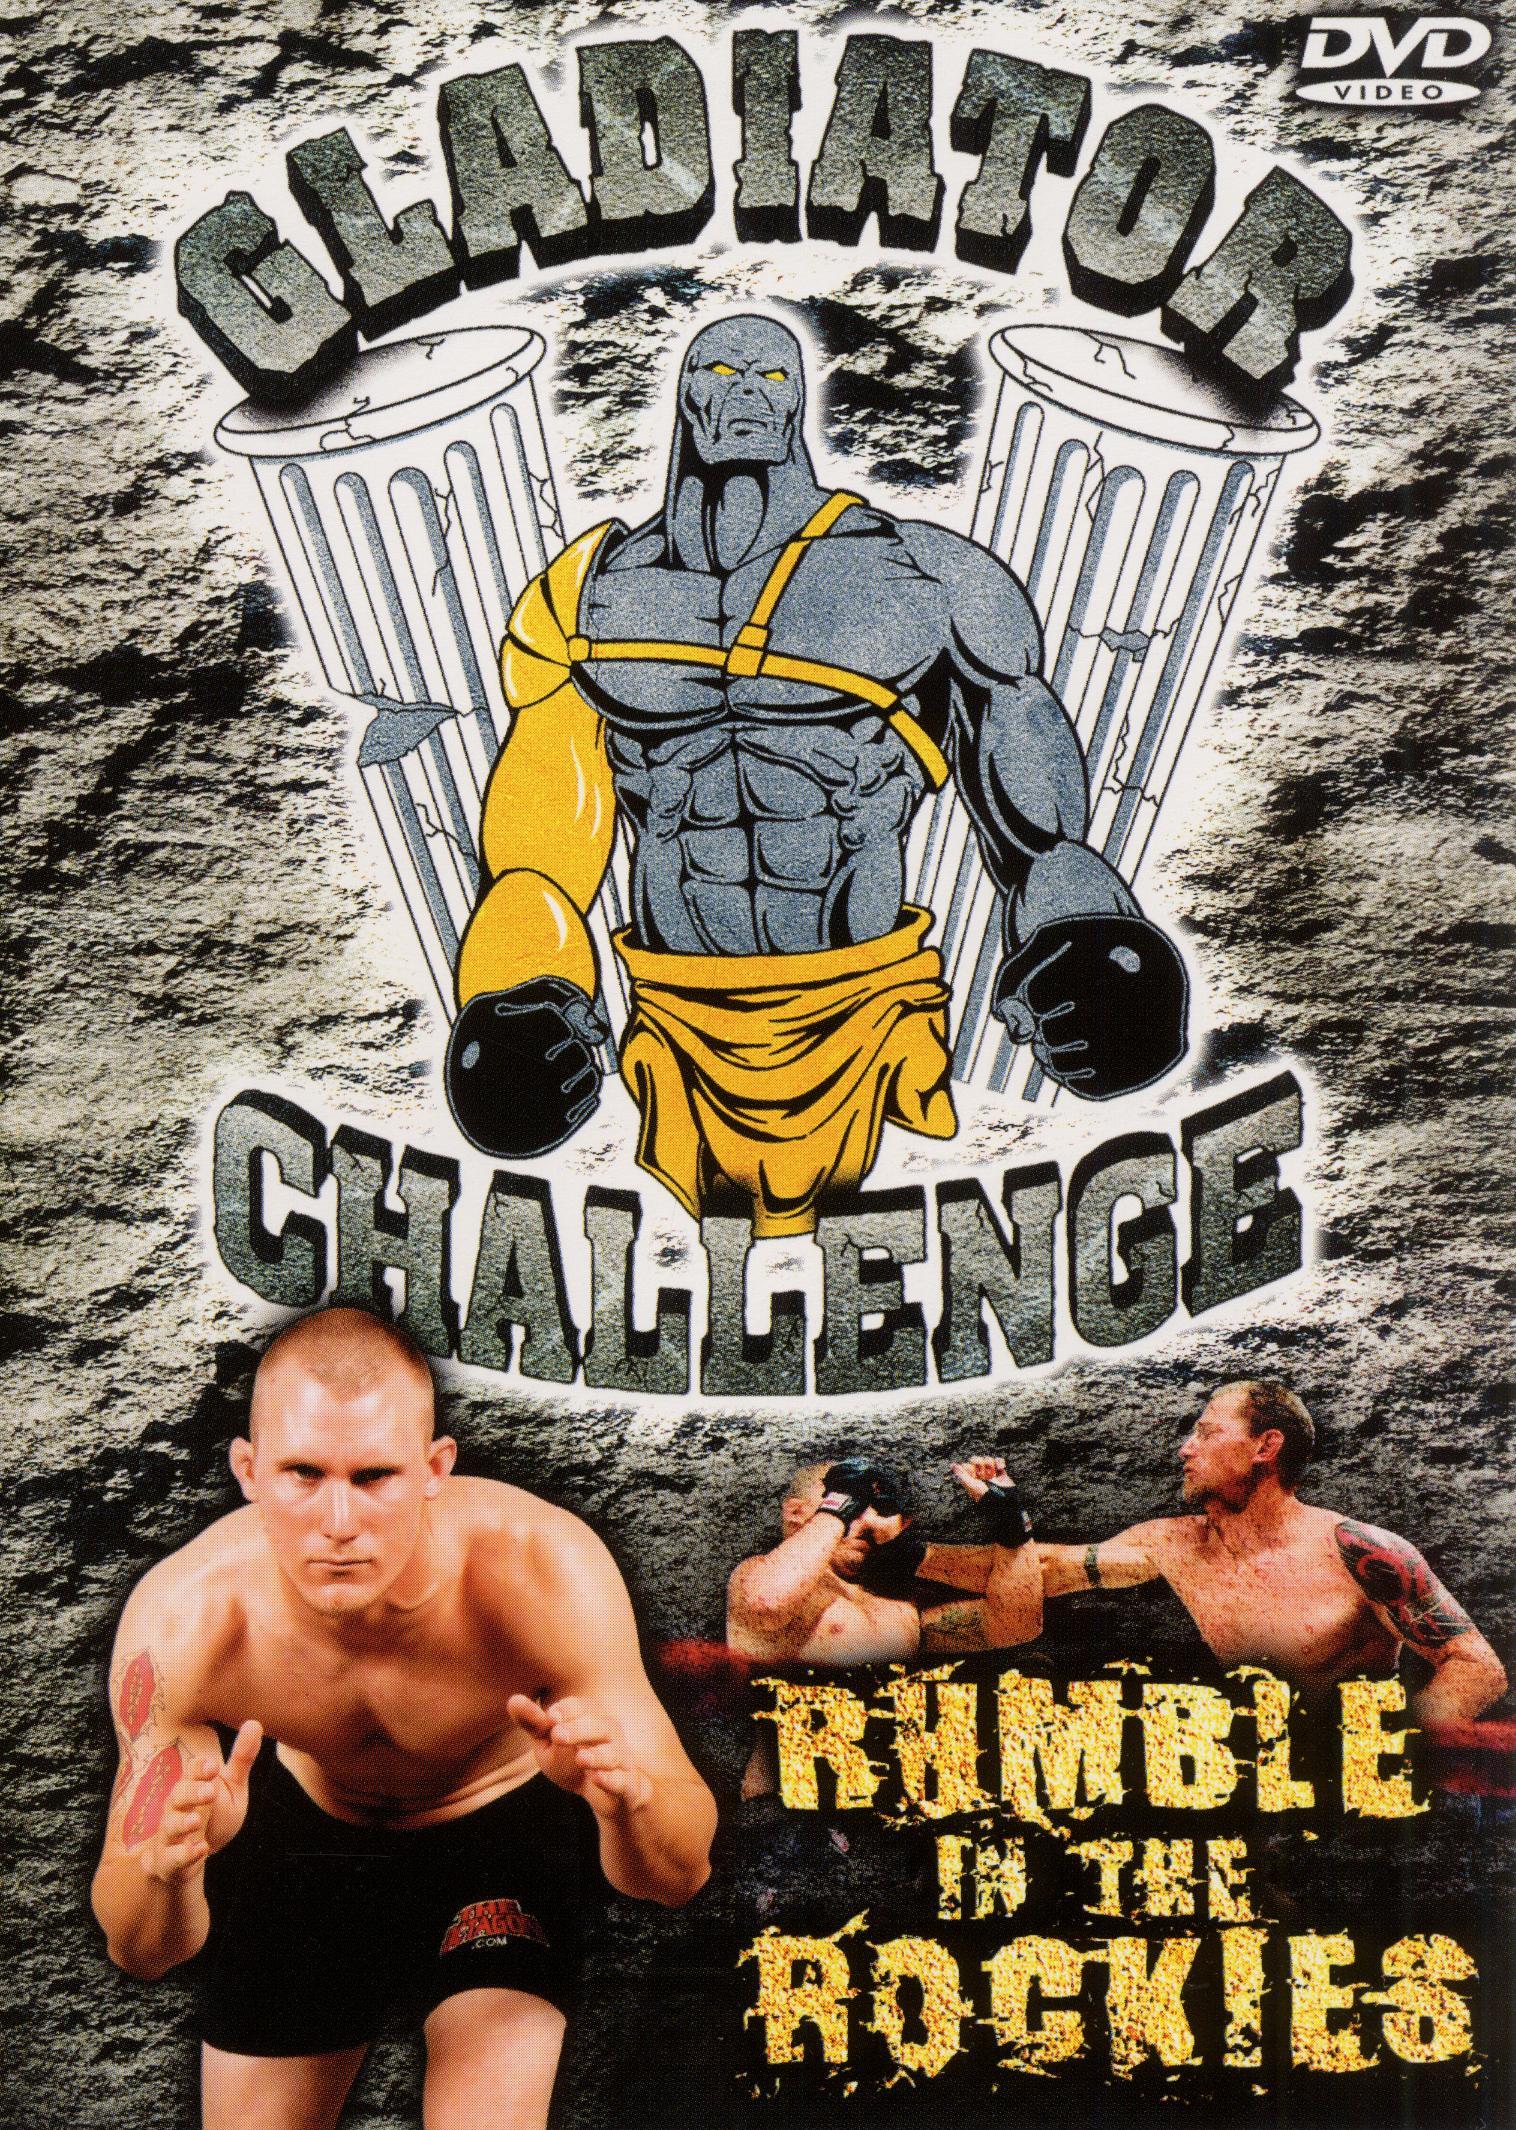 Gladiator Challenge: Rumble in the Rockies